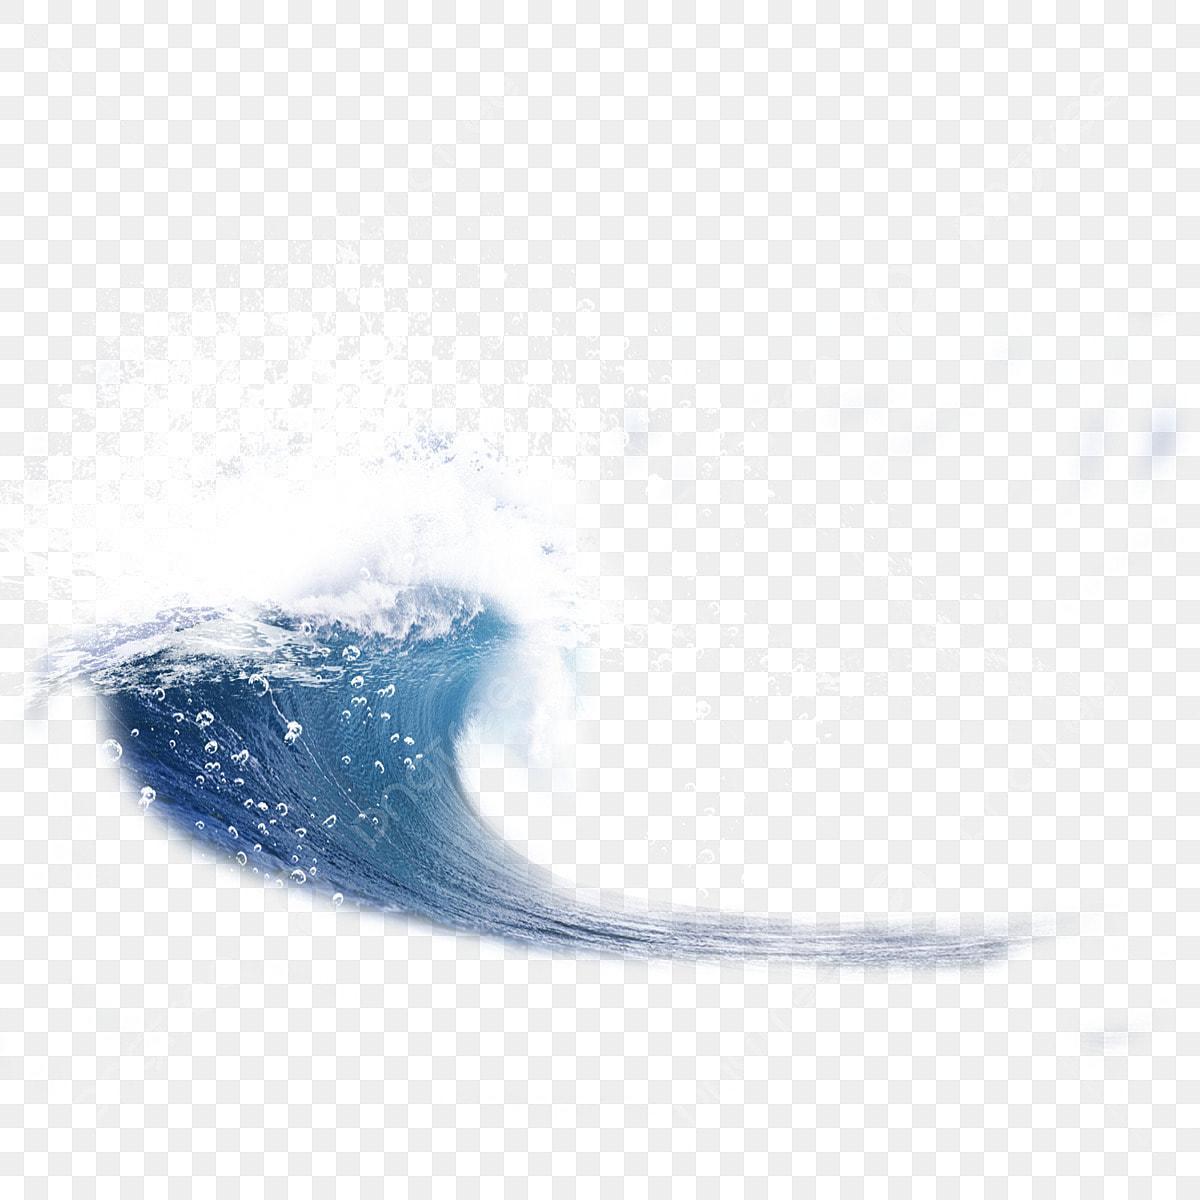 3d8d3b8c3 أمواج المحيط موجة ديناميكي المياه الديناميكية PNG صورة للتحميل مجانا